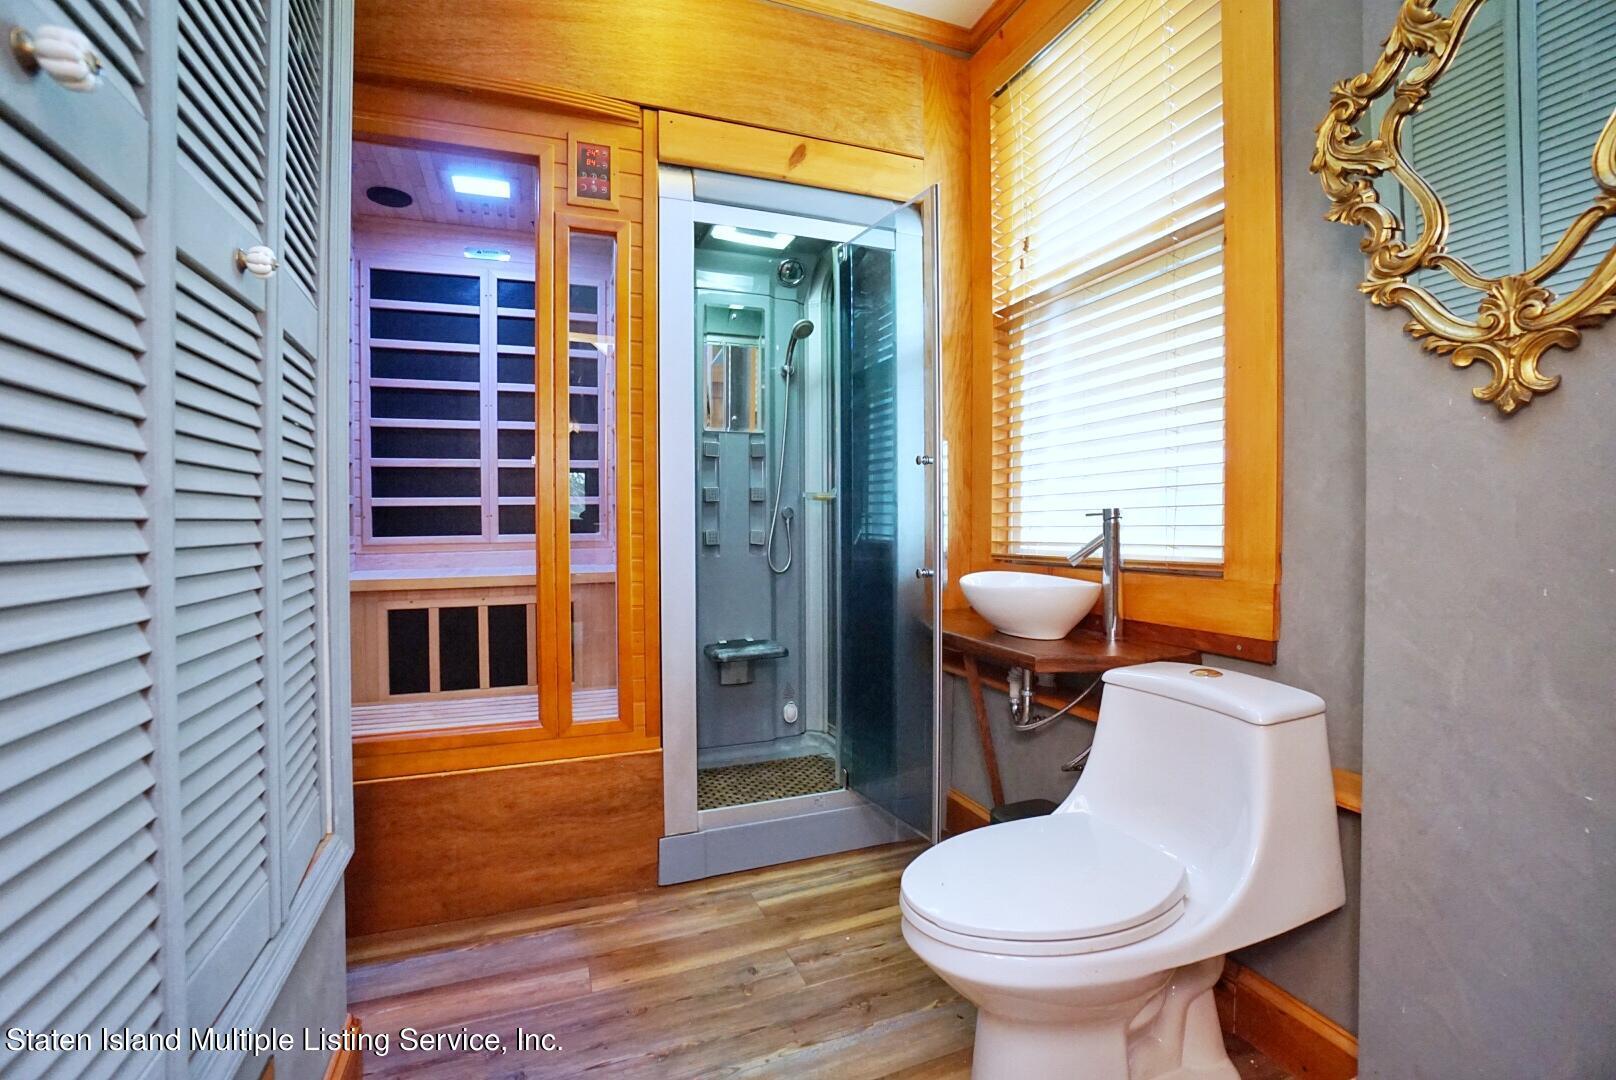 Single Family - Detached 136 York Avenue  Staten Island, NY 10301, MLS-1147575-22